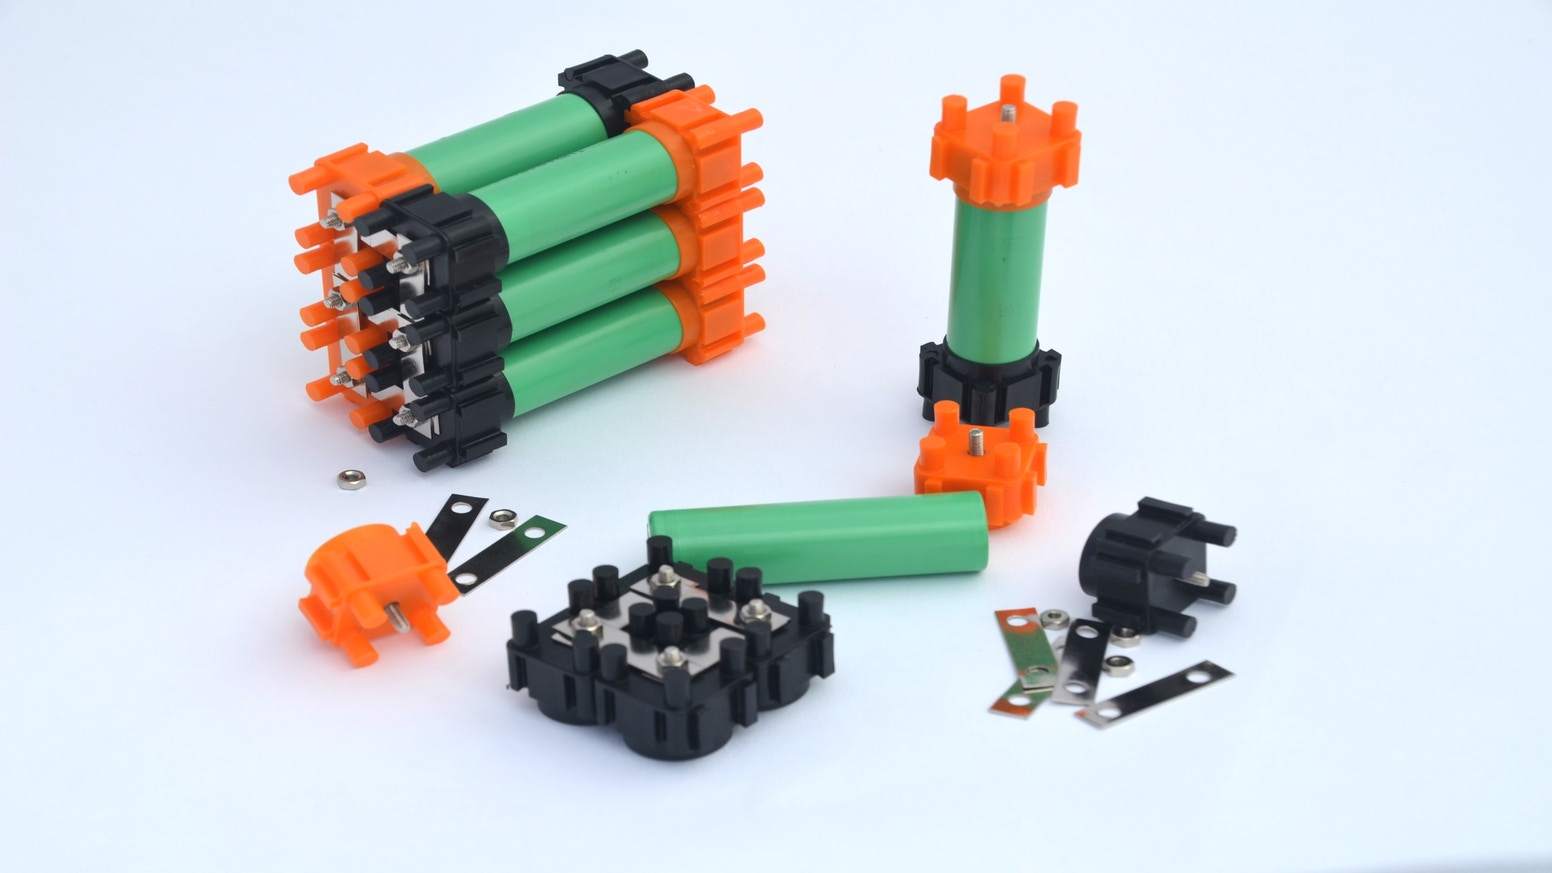 Diy Li Ion Battery Building Kit Make Your Own 18650